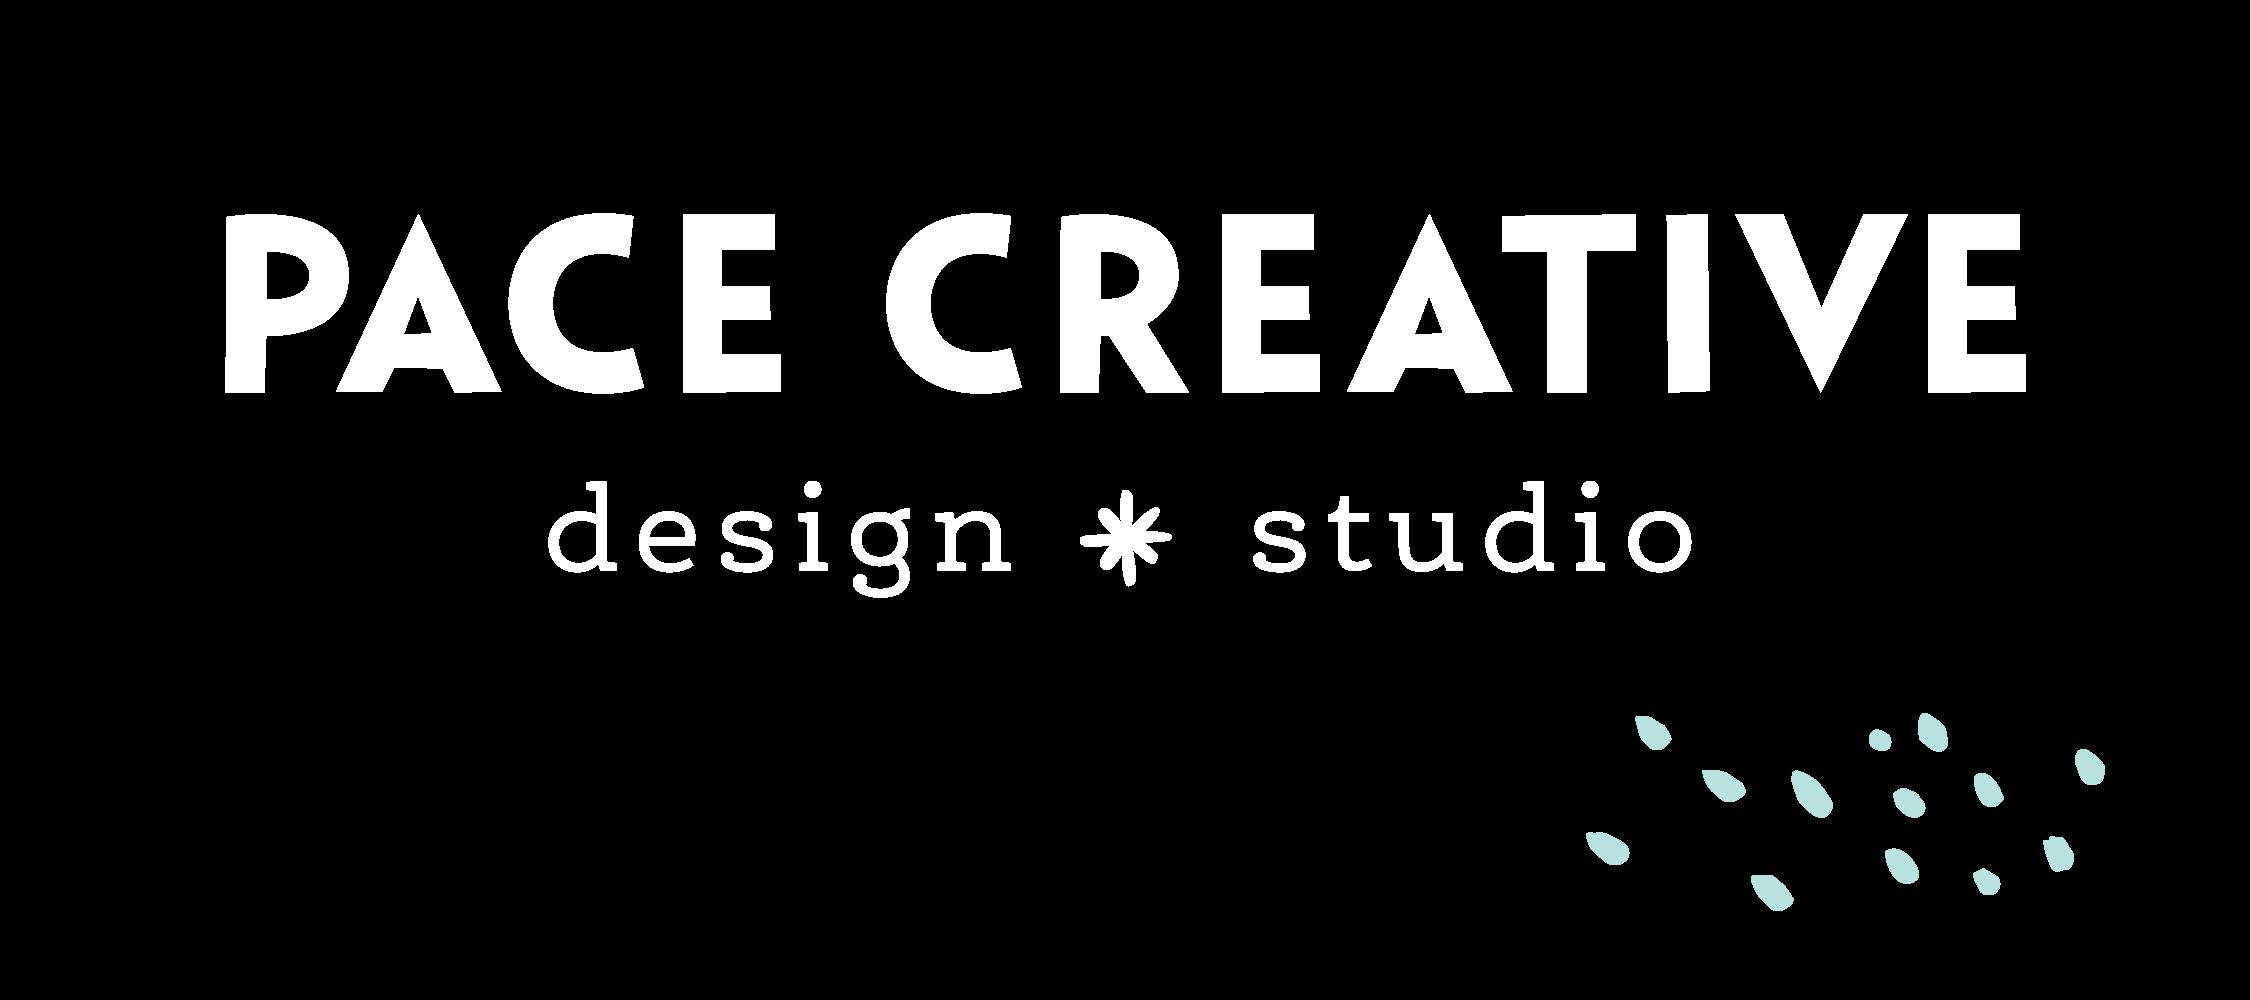 Pace Creative Design Studio